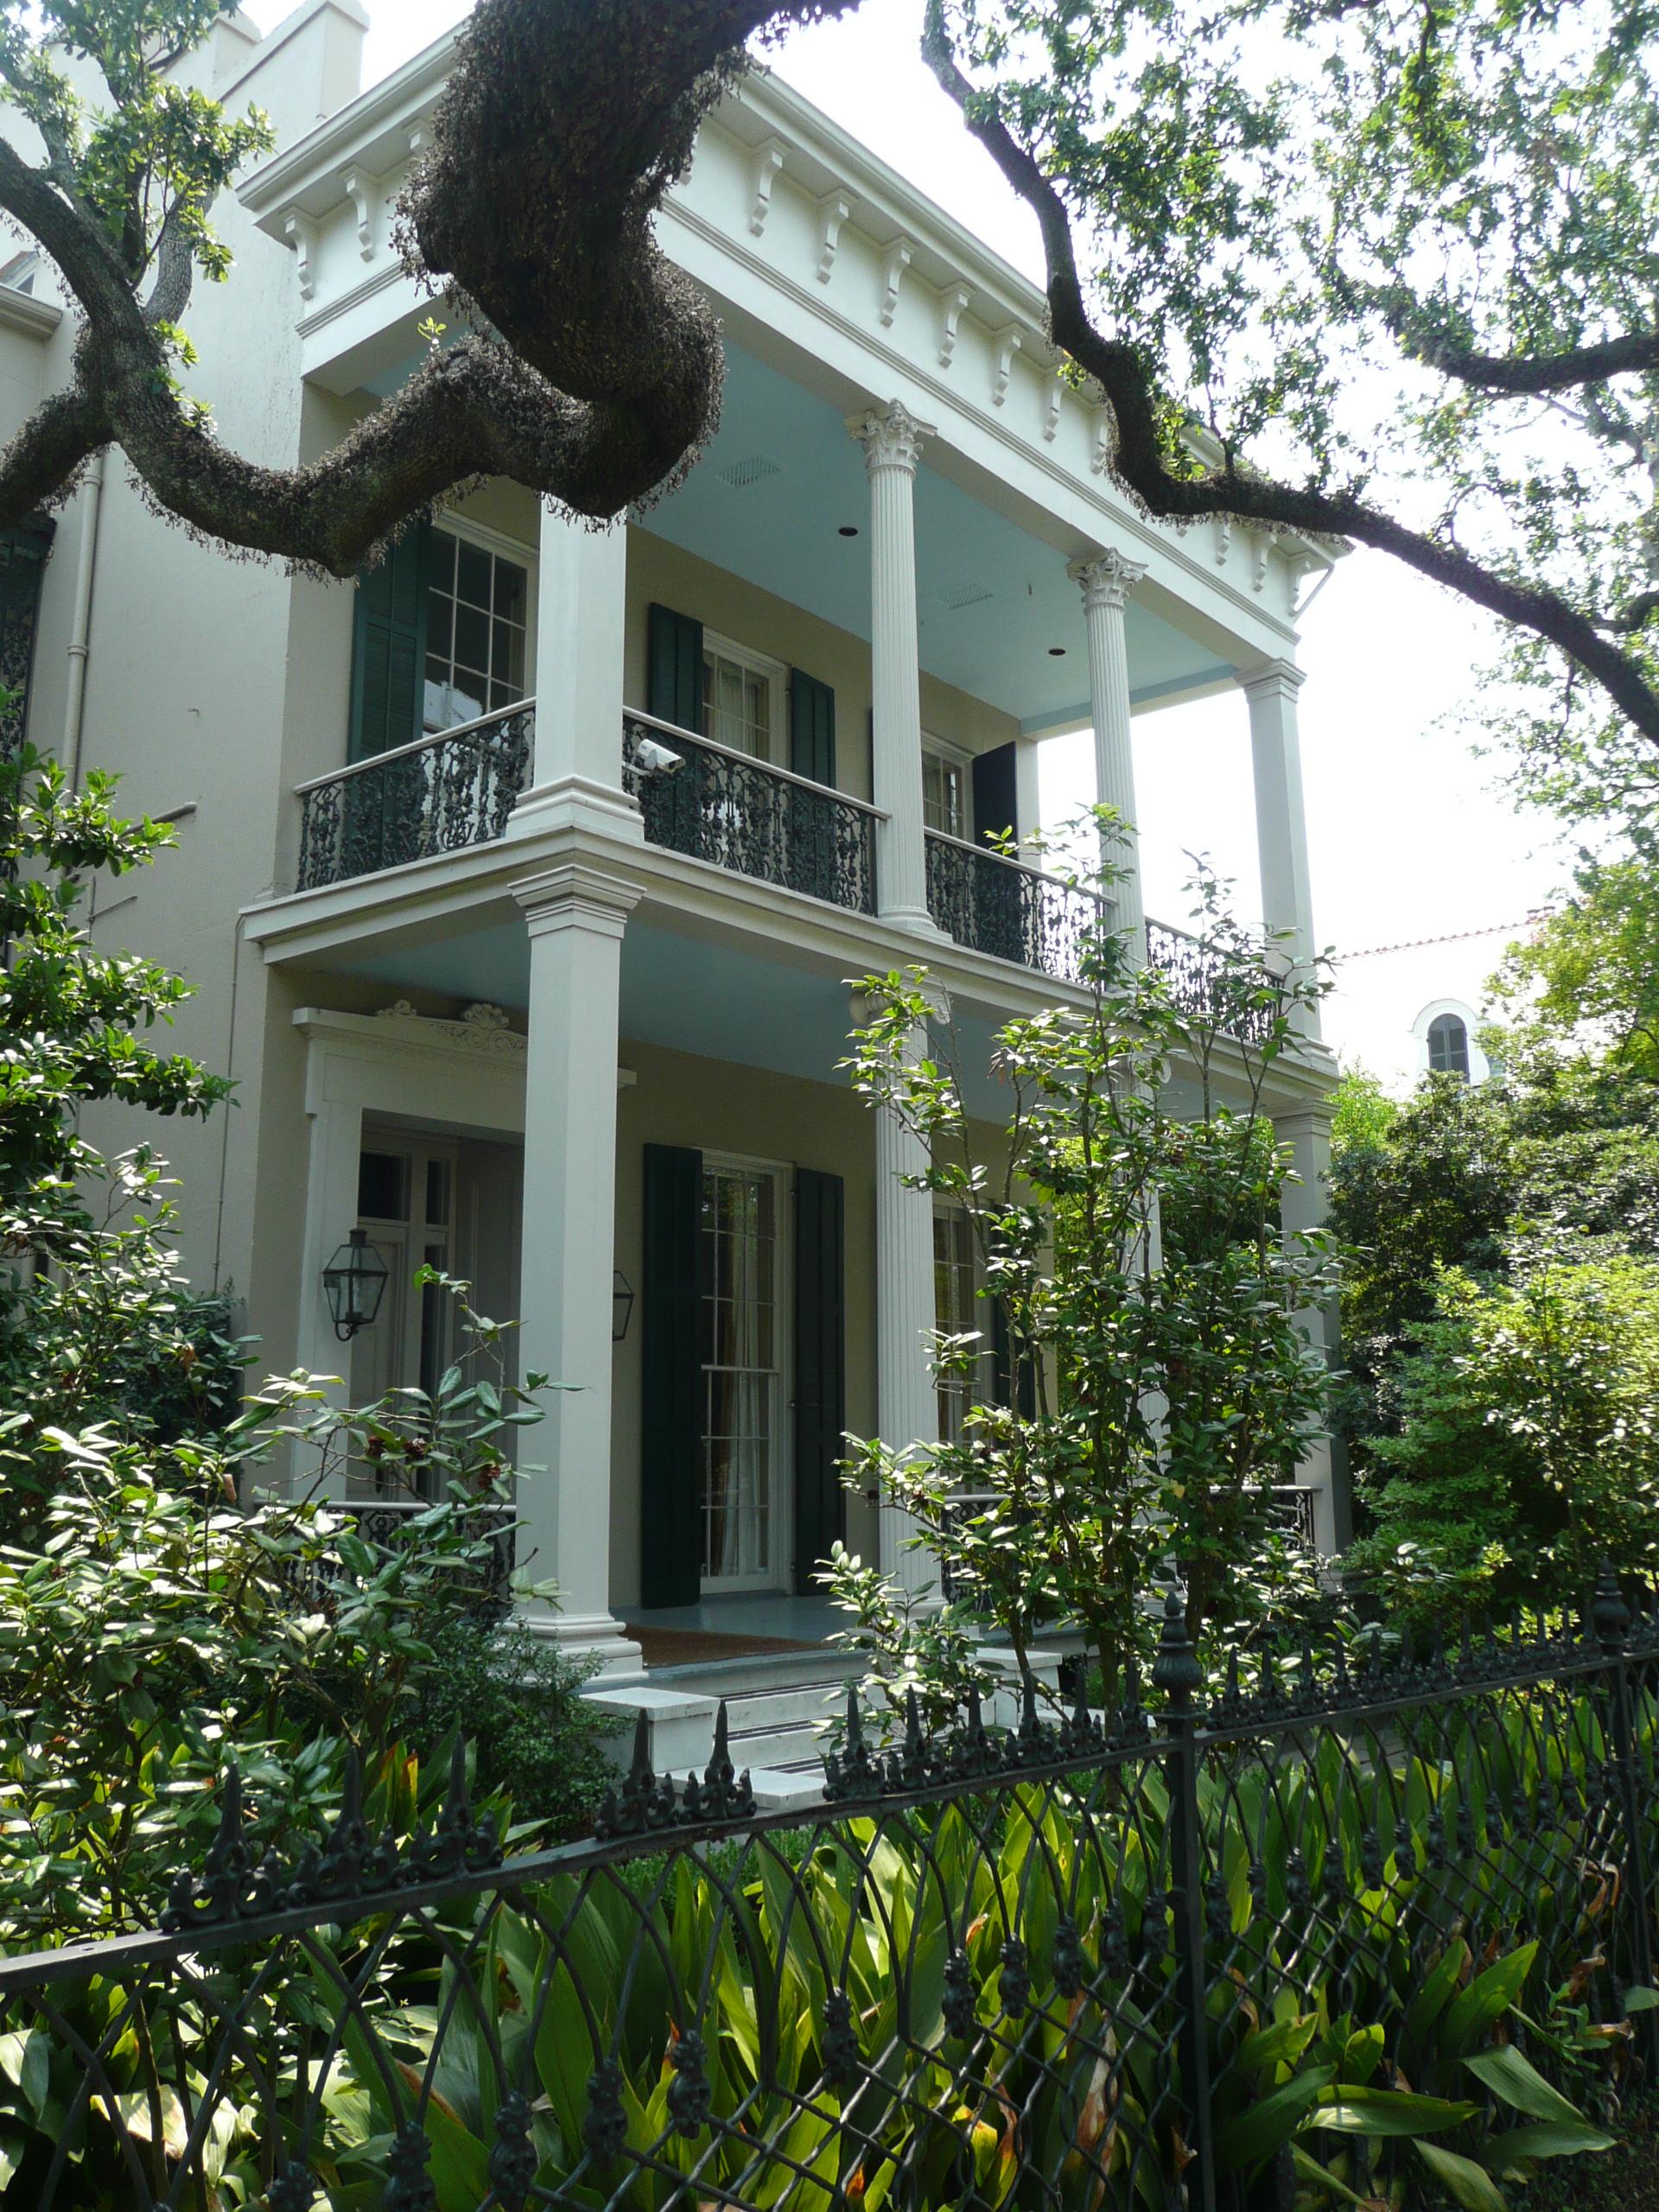 File:New Orleans 1239 First Street.jpg